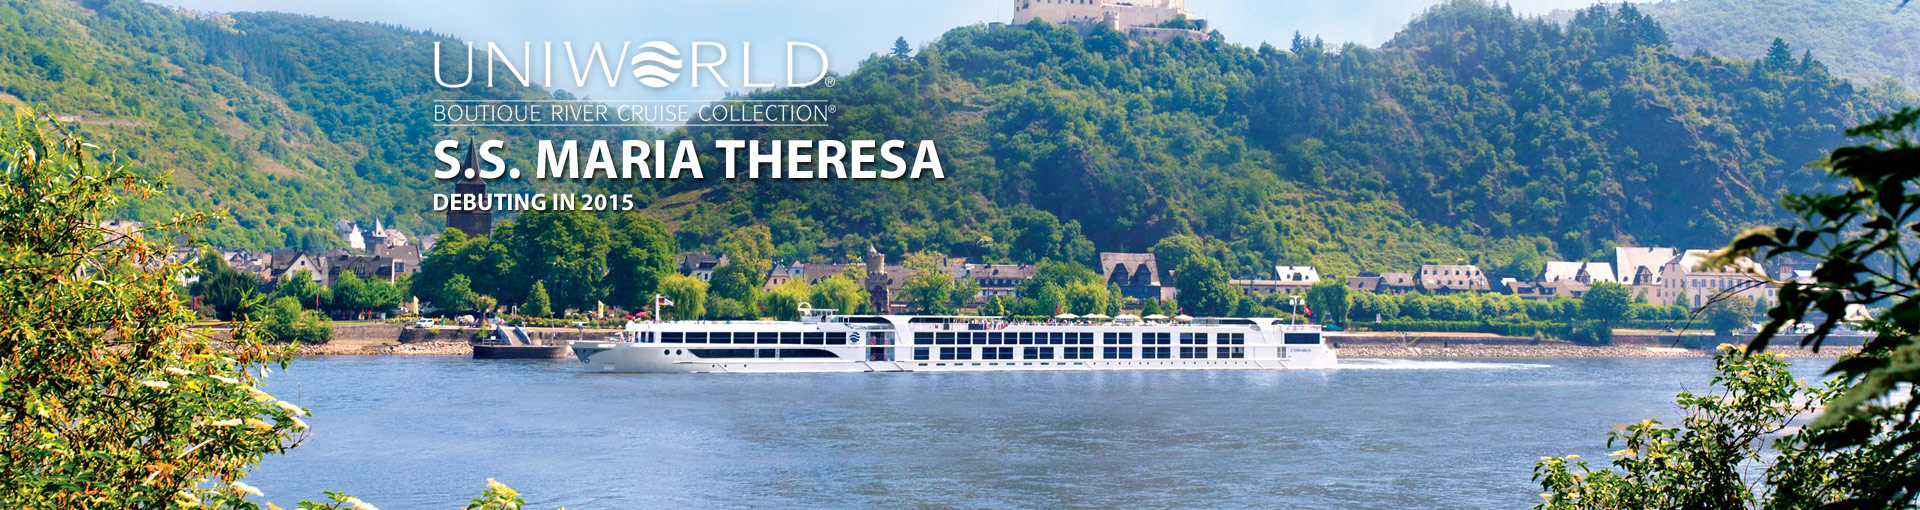 Uniworld River Cruises S.S. Maria Theresa